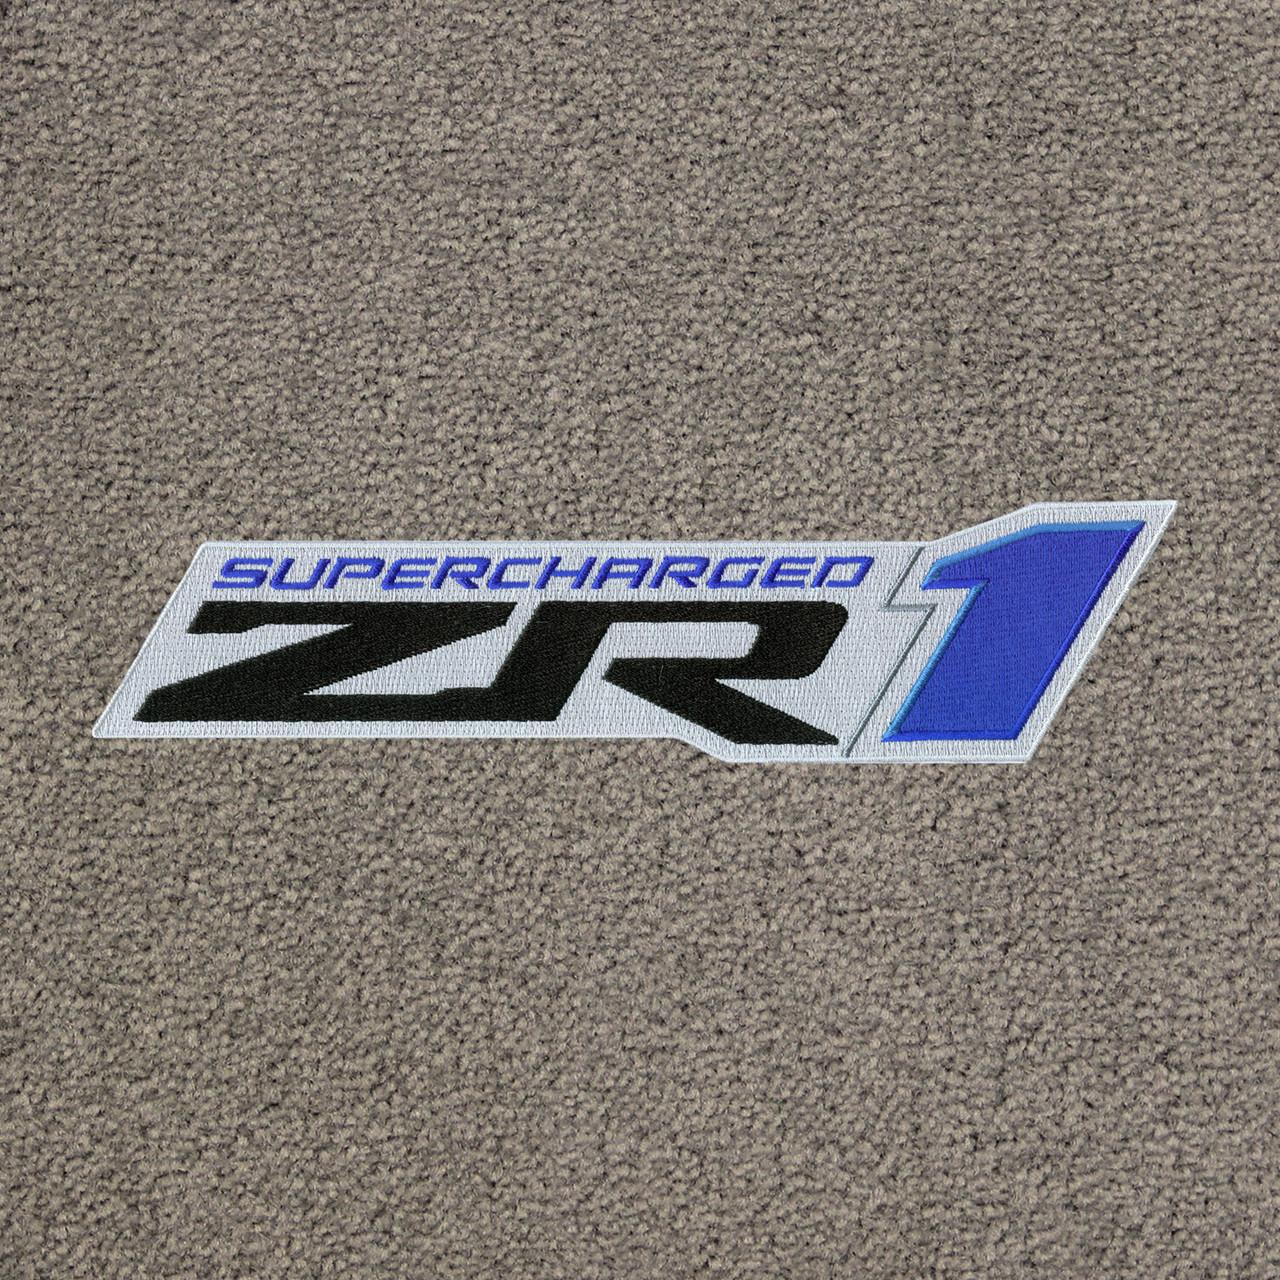 C6 ZR1 Logo on Euro Gray Mat